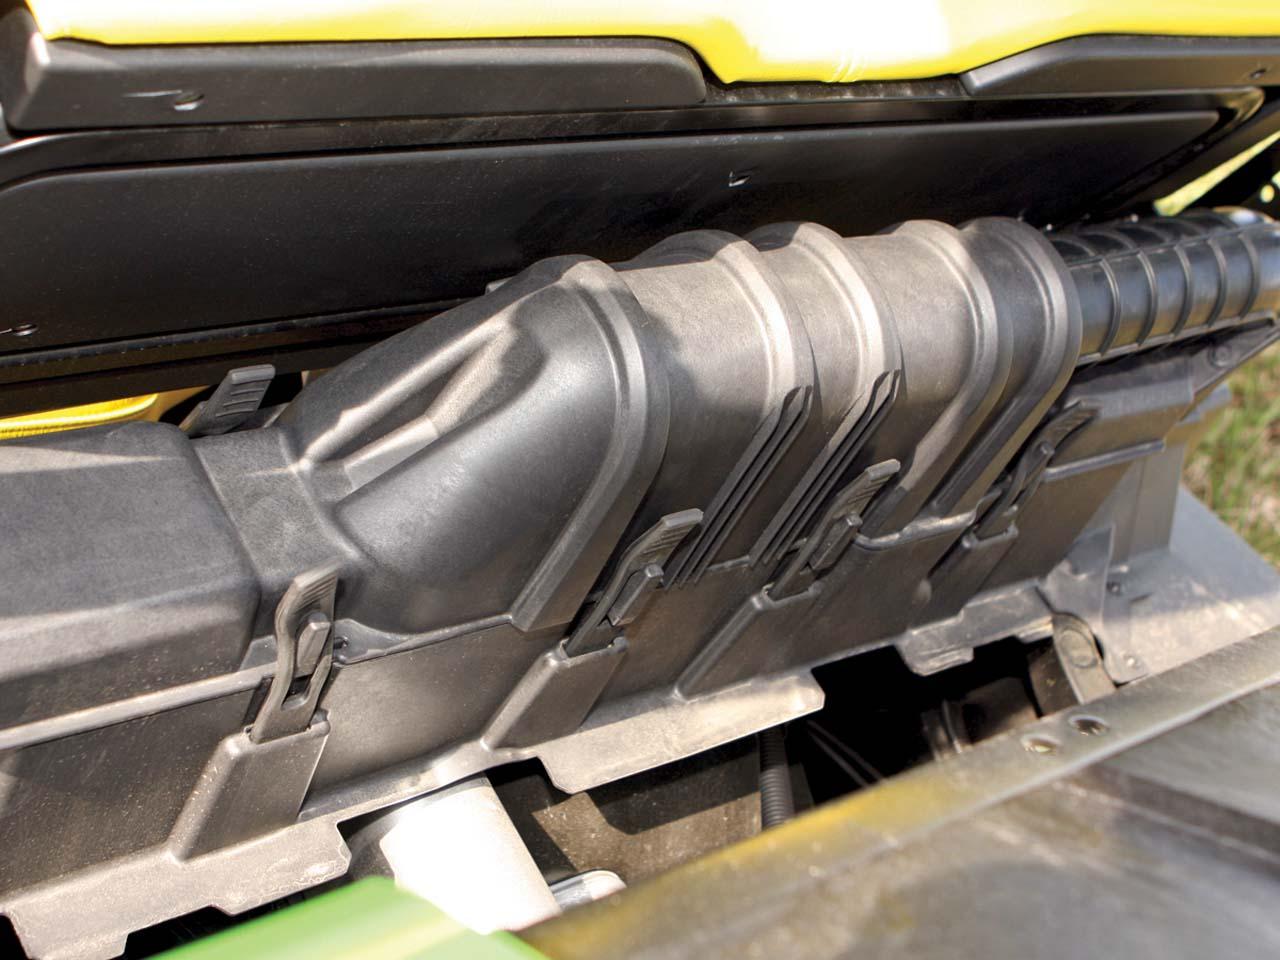 John Deere Gator Xuv 550 Parts Diagramon 2003 Kawasaki Vulcan 750 Wiring Diagram